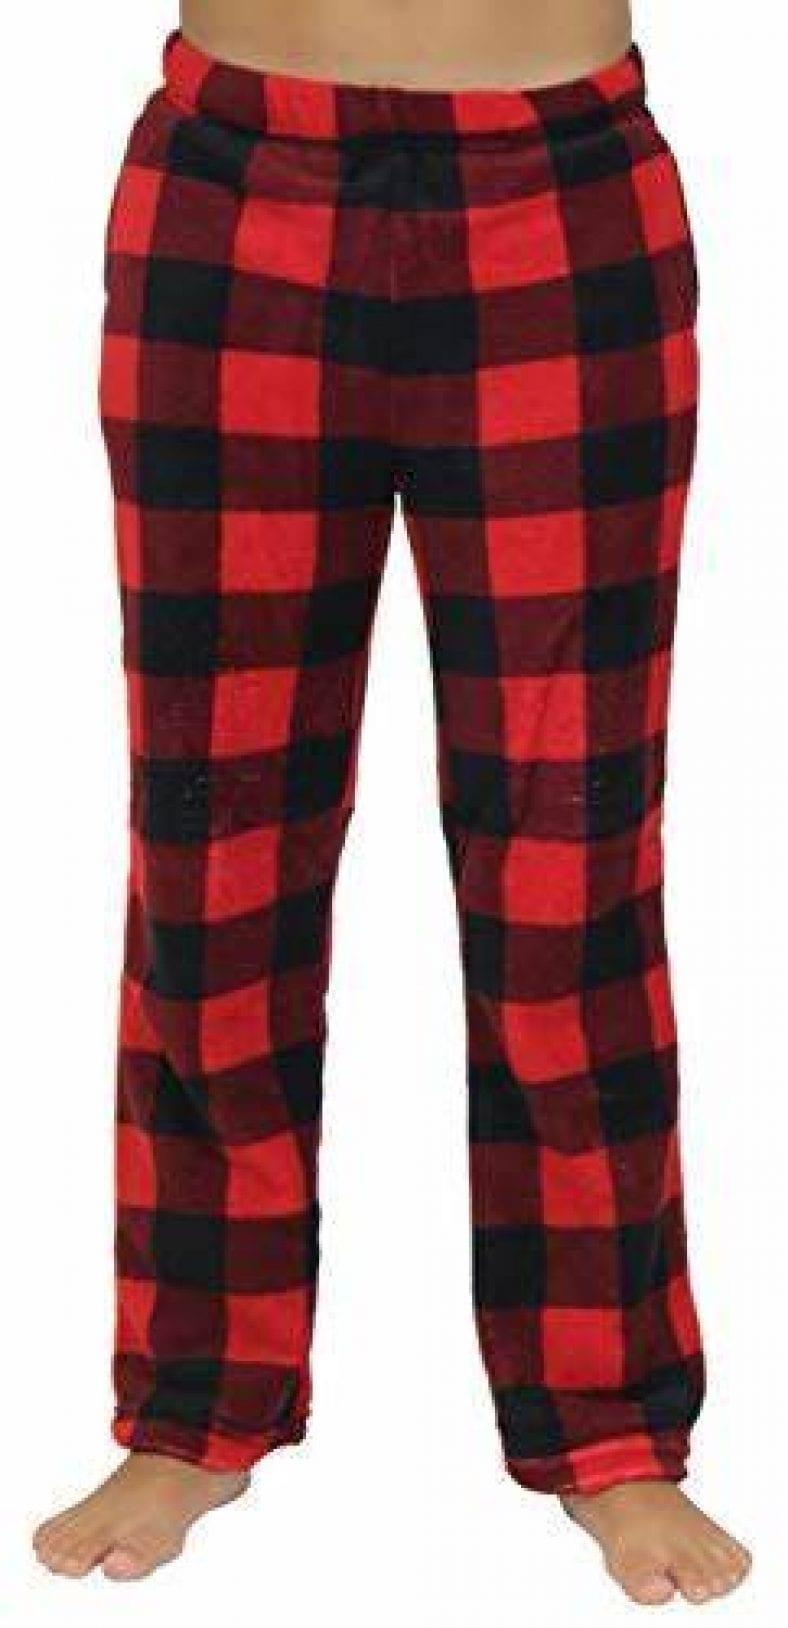 Sleep Chic Woman's Fleece Pajama Pants JUST 5.99!!!! (was 24.99)